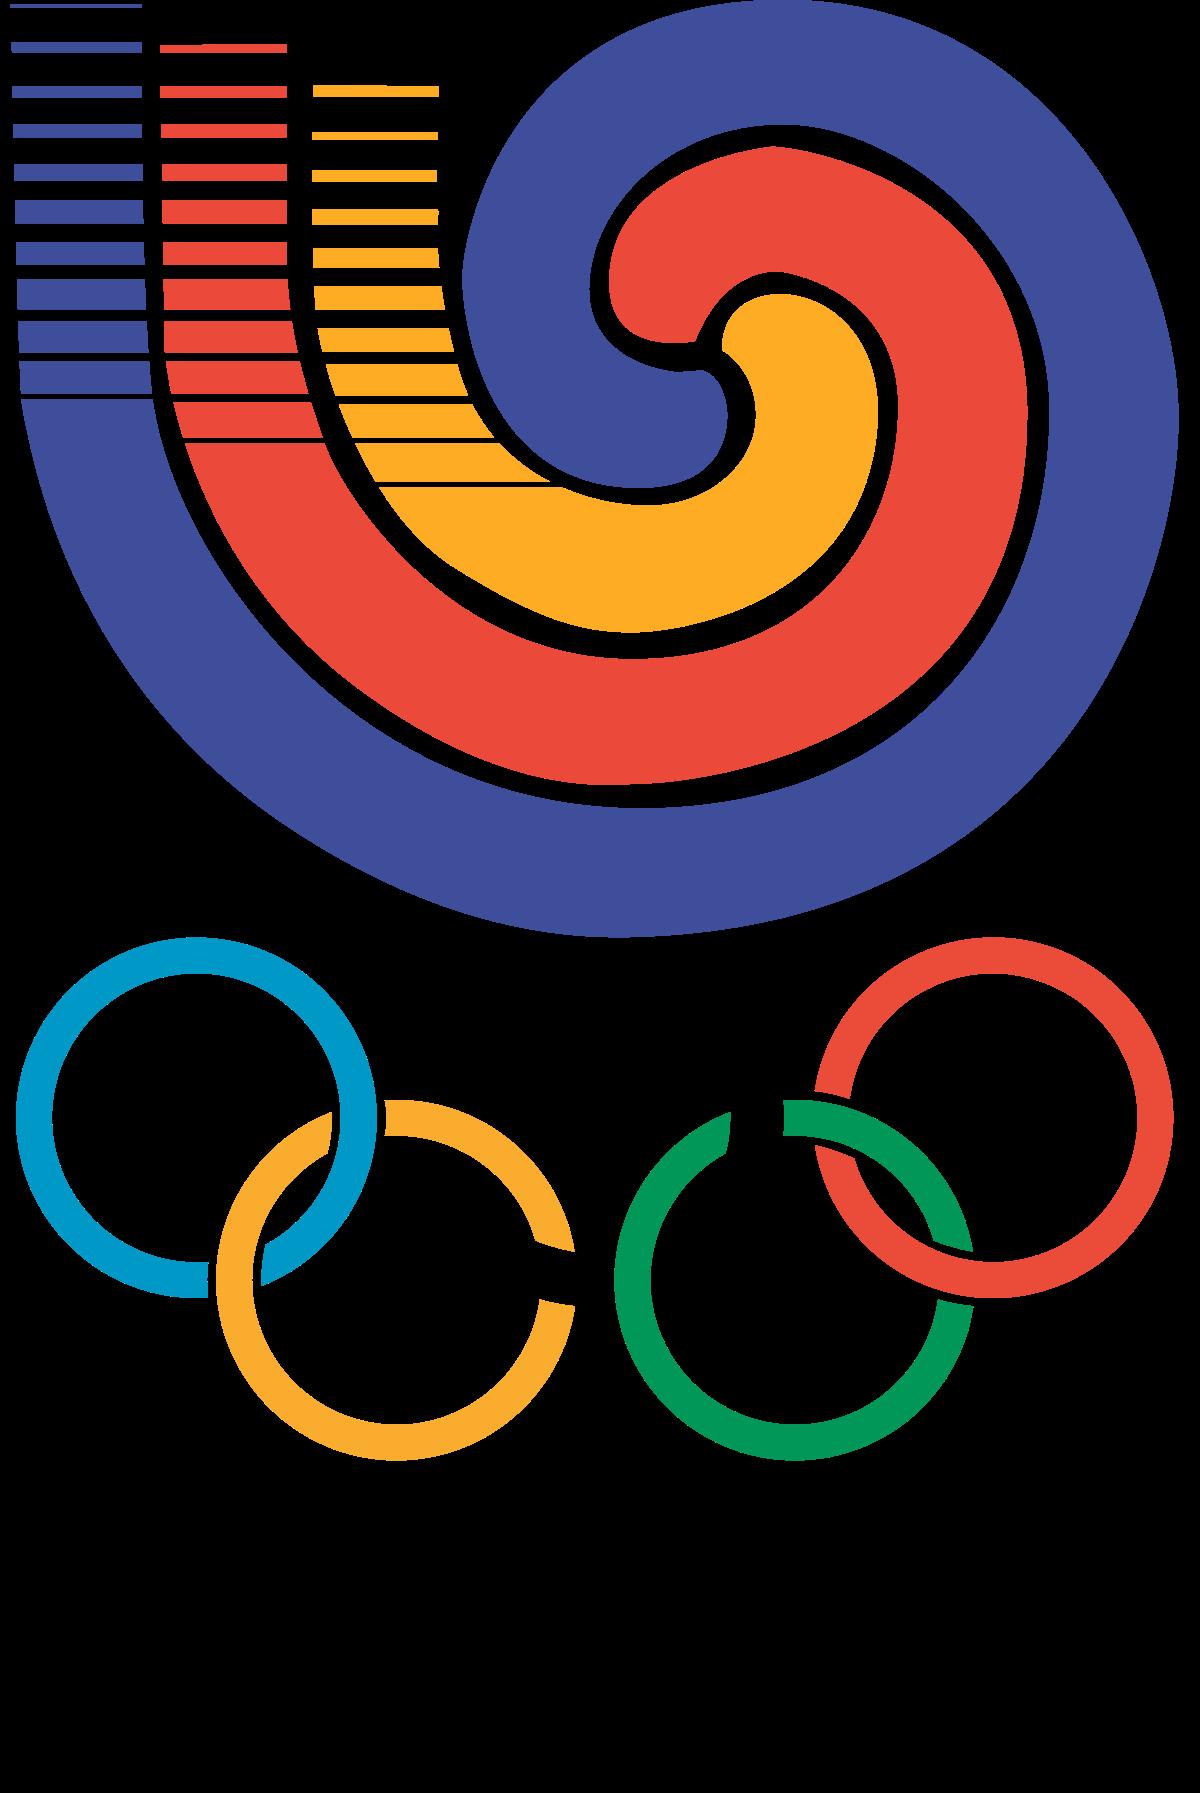 Track Field Symbols